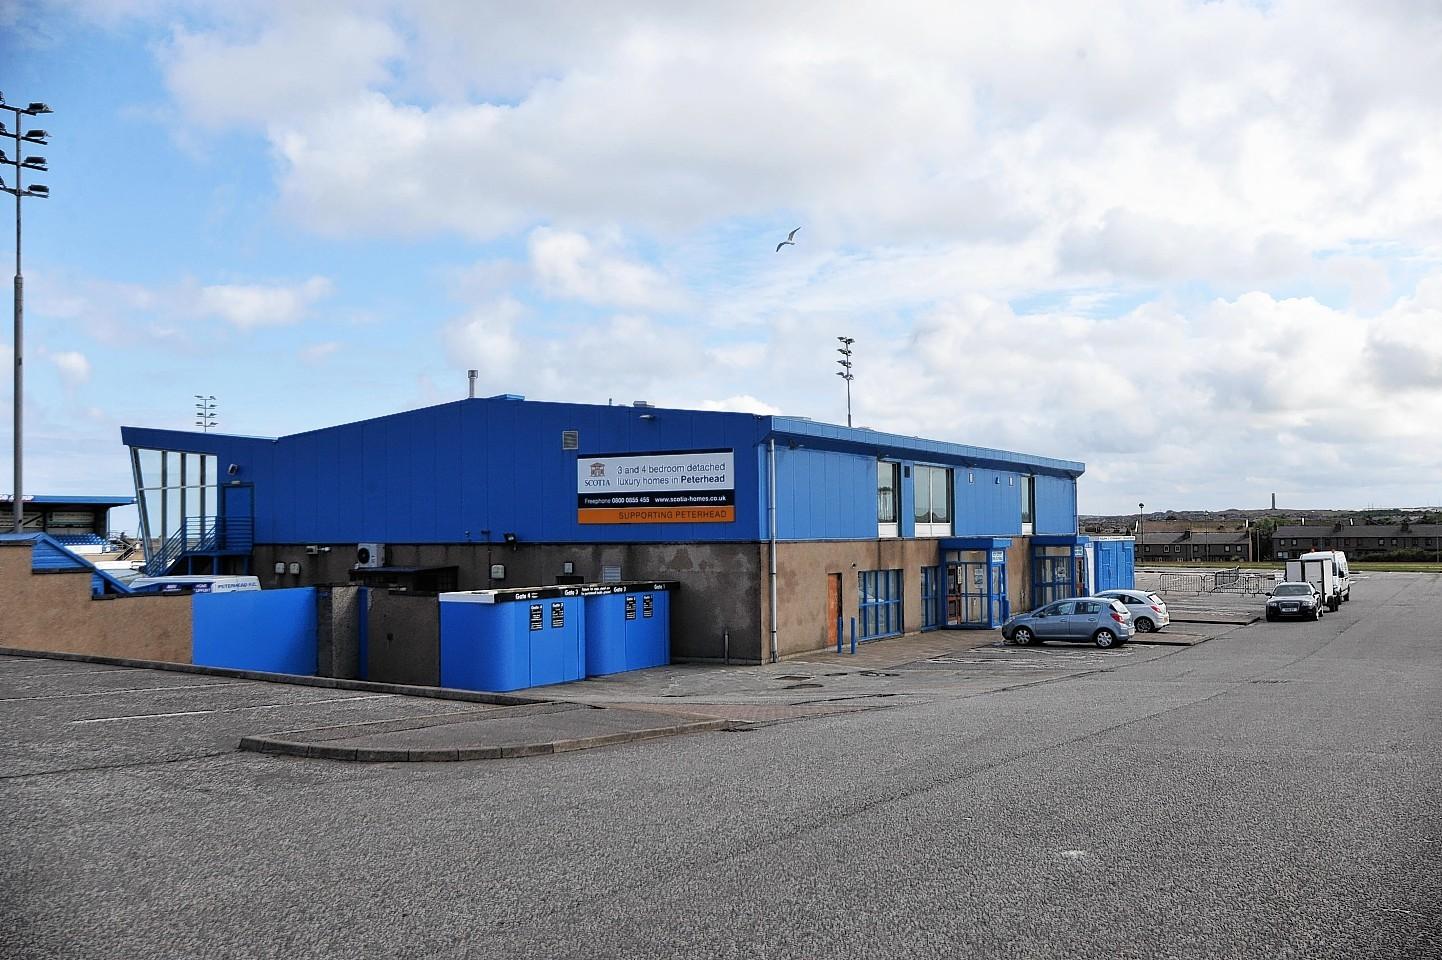 Balmoor Stadium, Peterhead